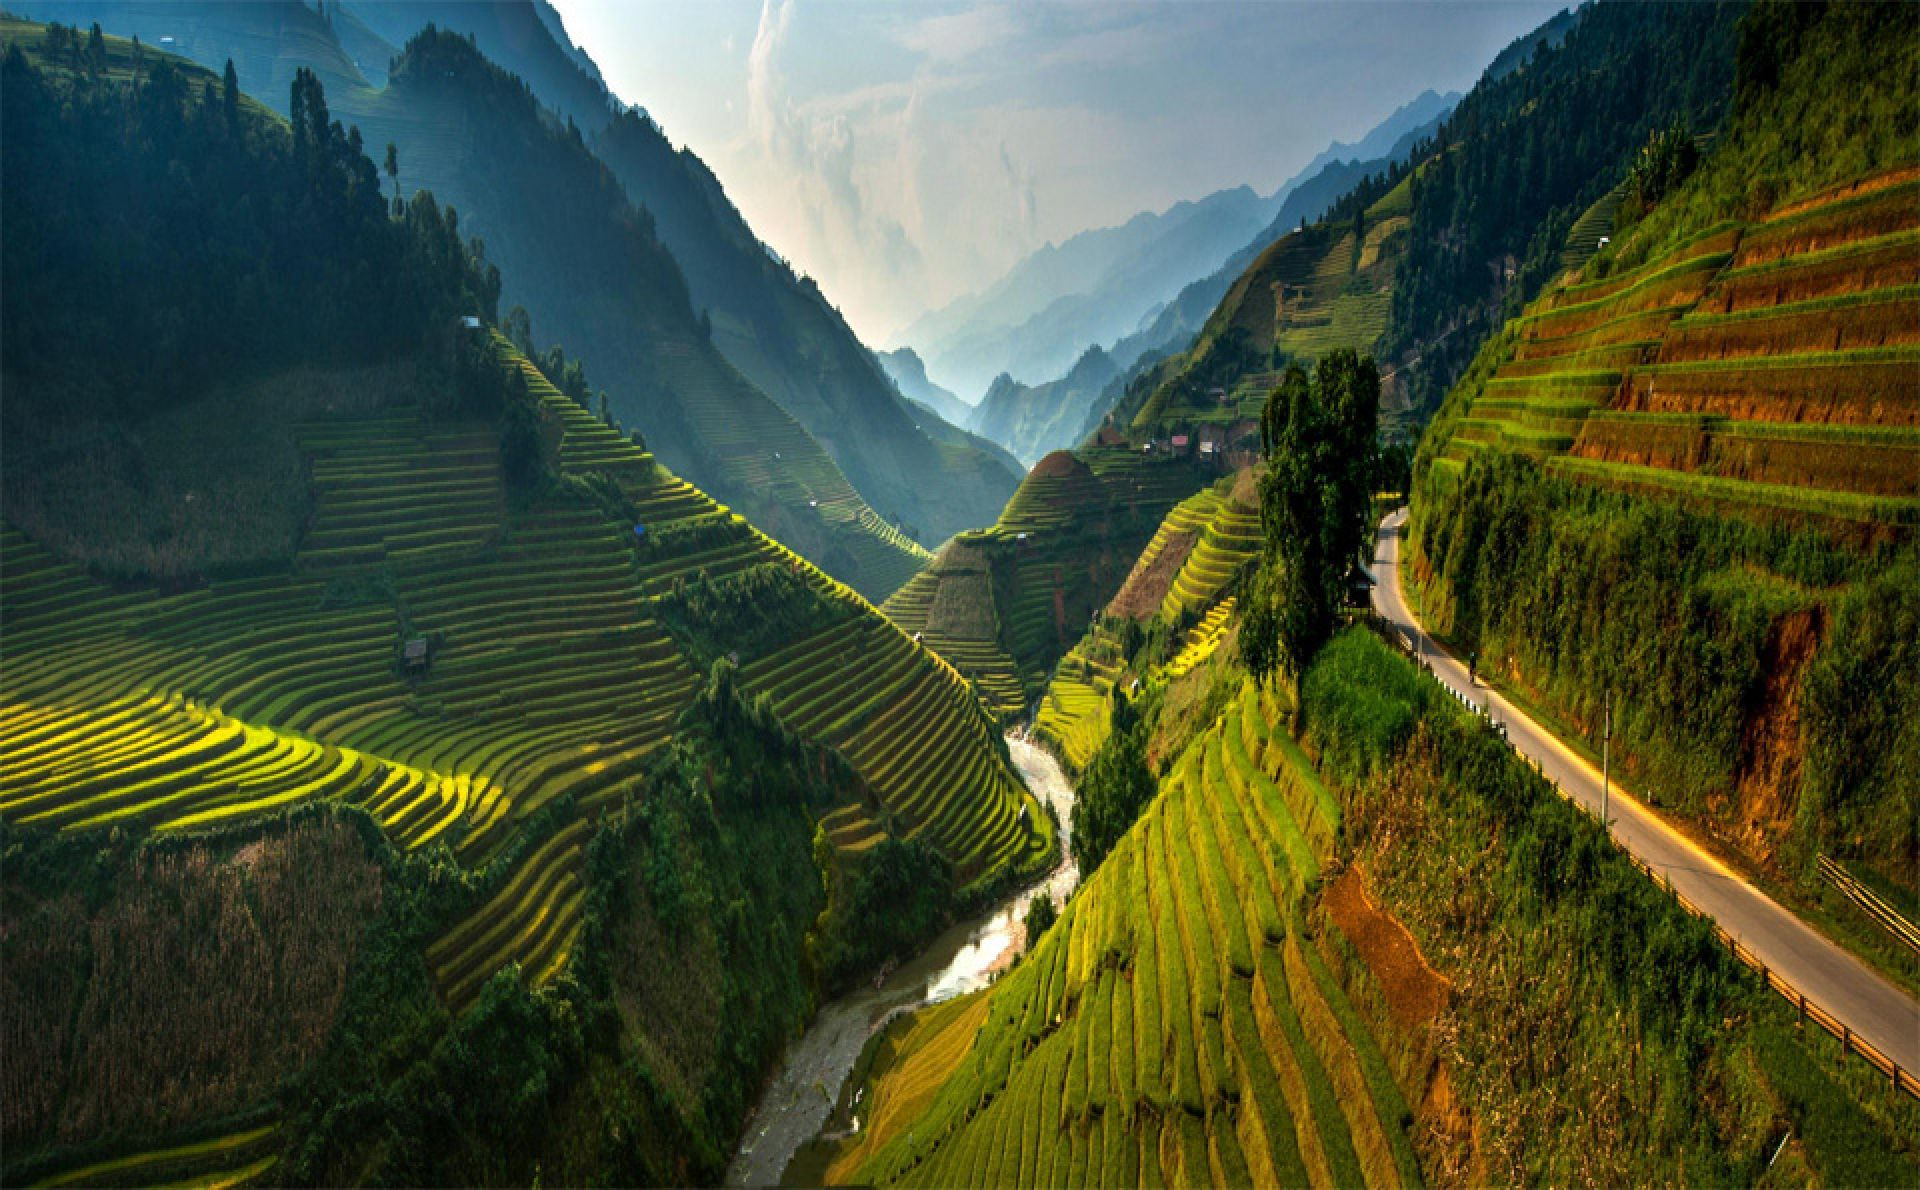 vietnam high quality wallpaper 67384912